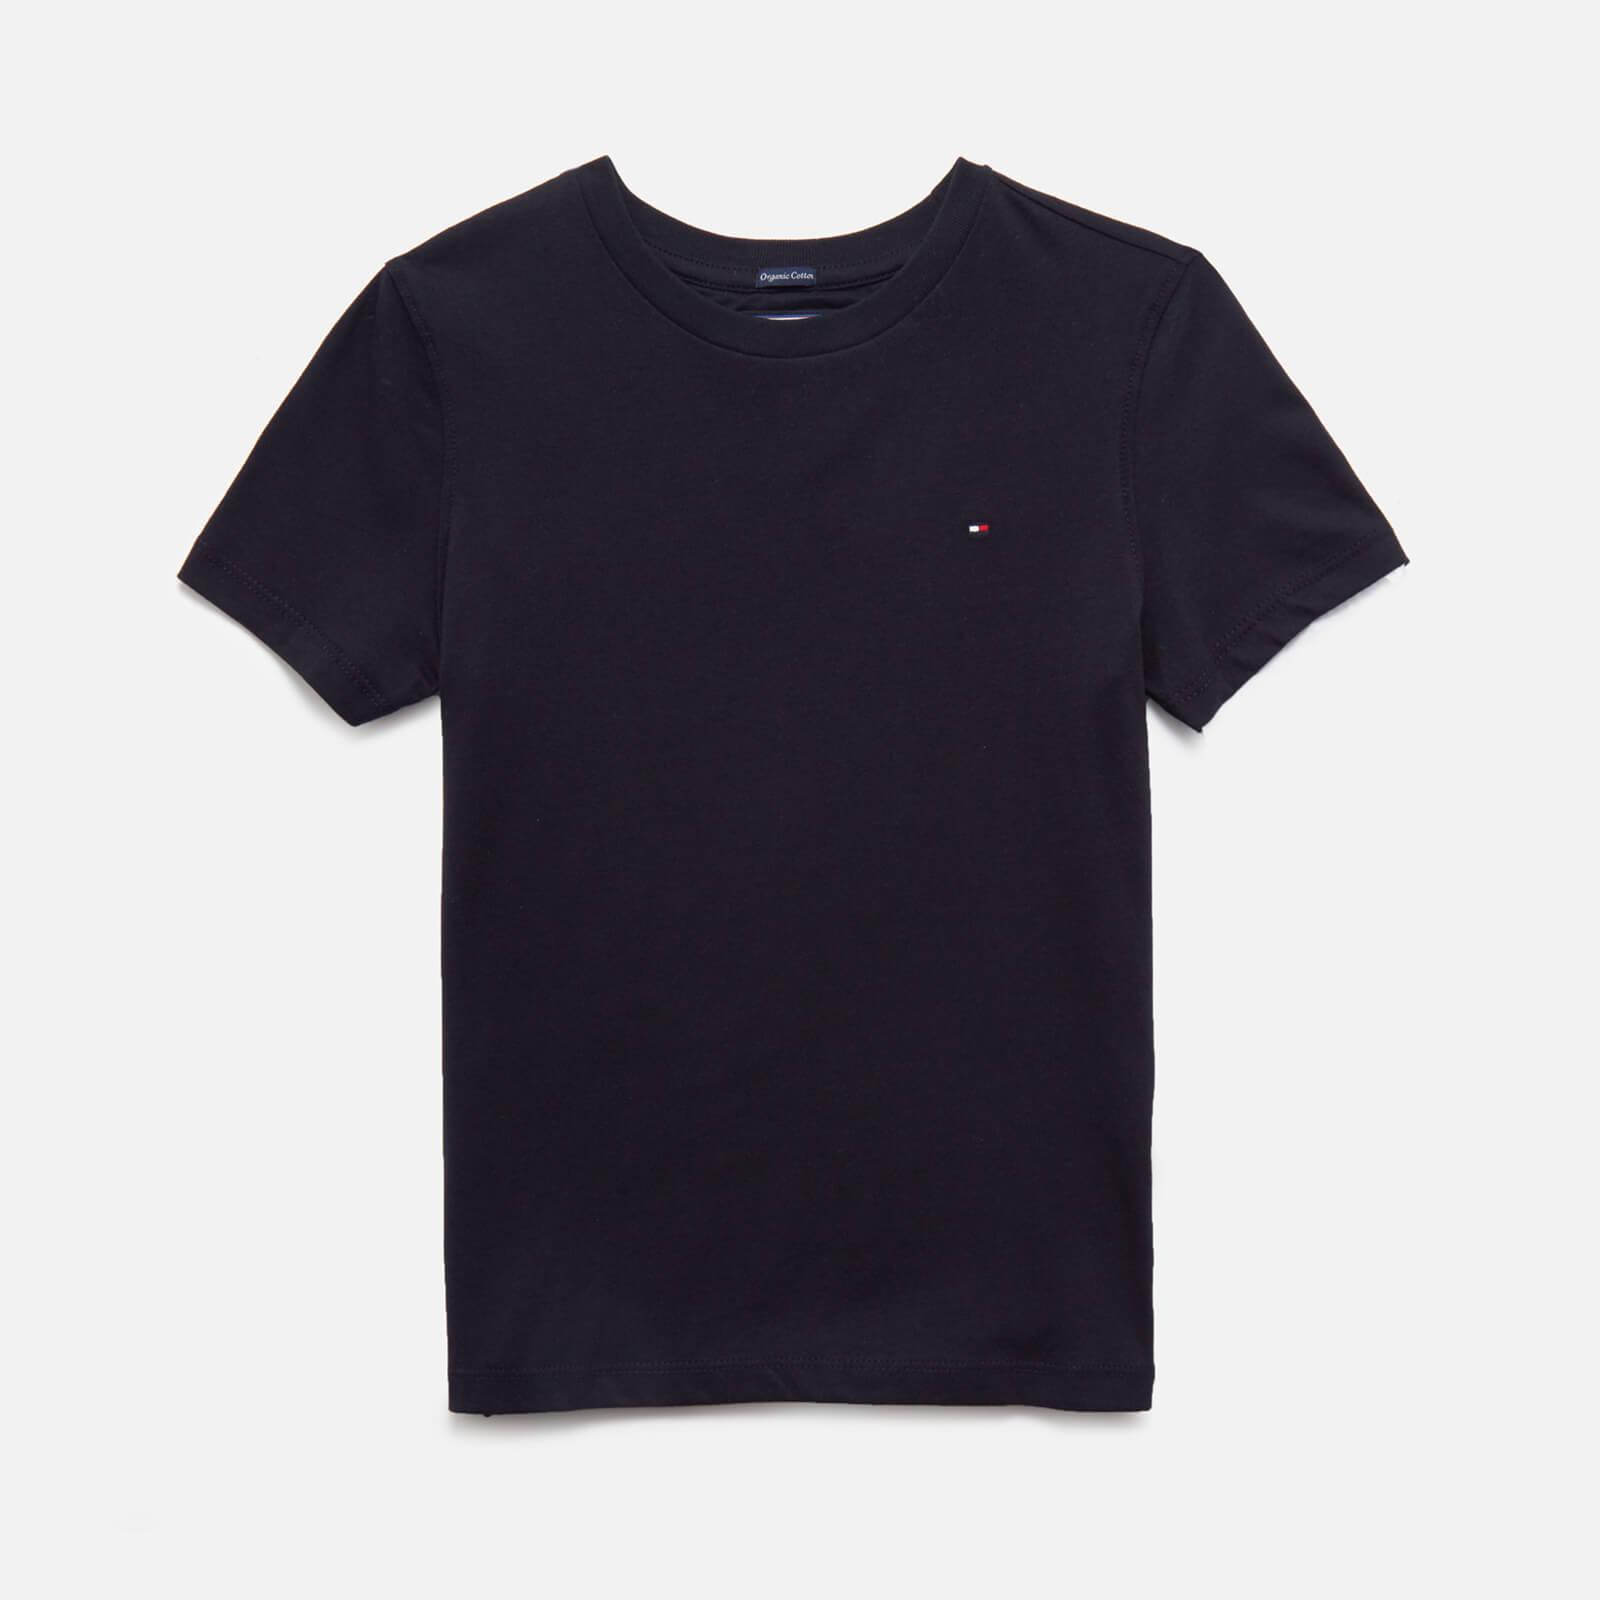 Tommy Kids Boys' Short Sleeve T-Shirt - Sky Captain - 14 Years